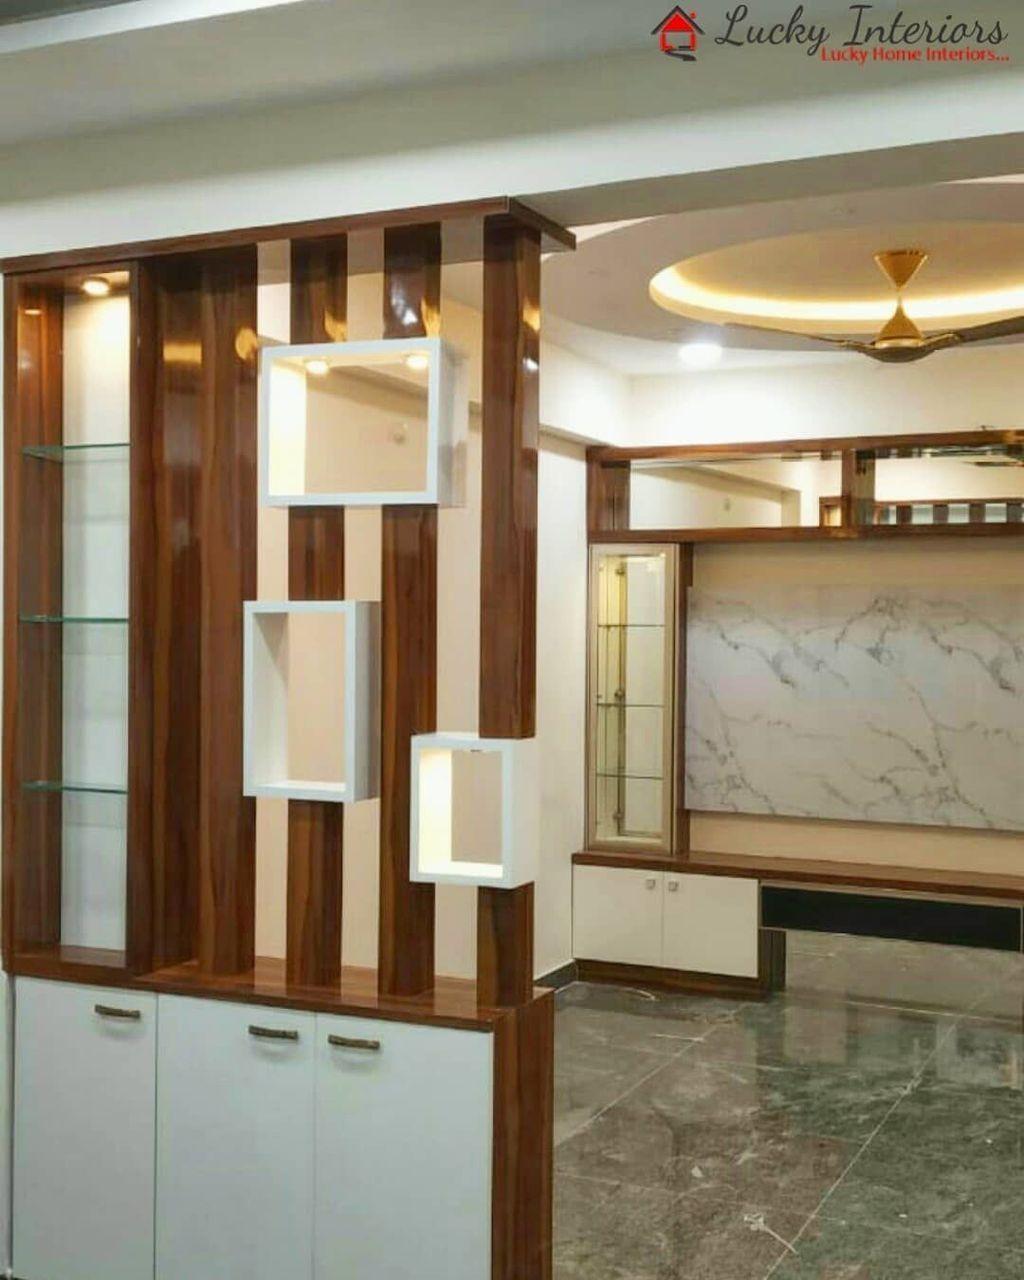 30 Affordable Glass Partition Living Room Design Ideas To Try In 2020 Living Room Partition Design Wall Partition Design Living Room Partition